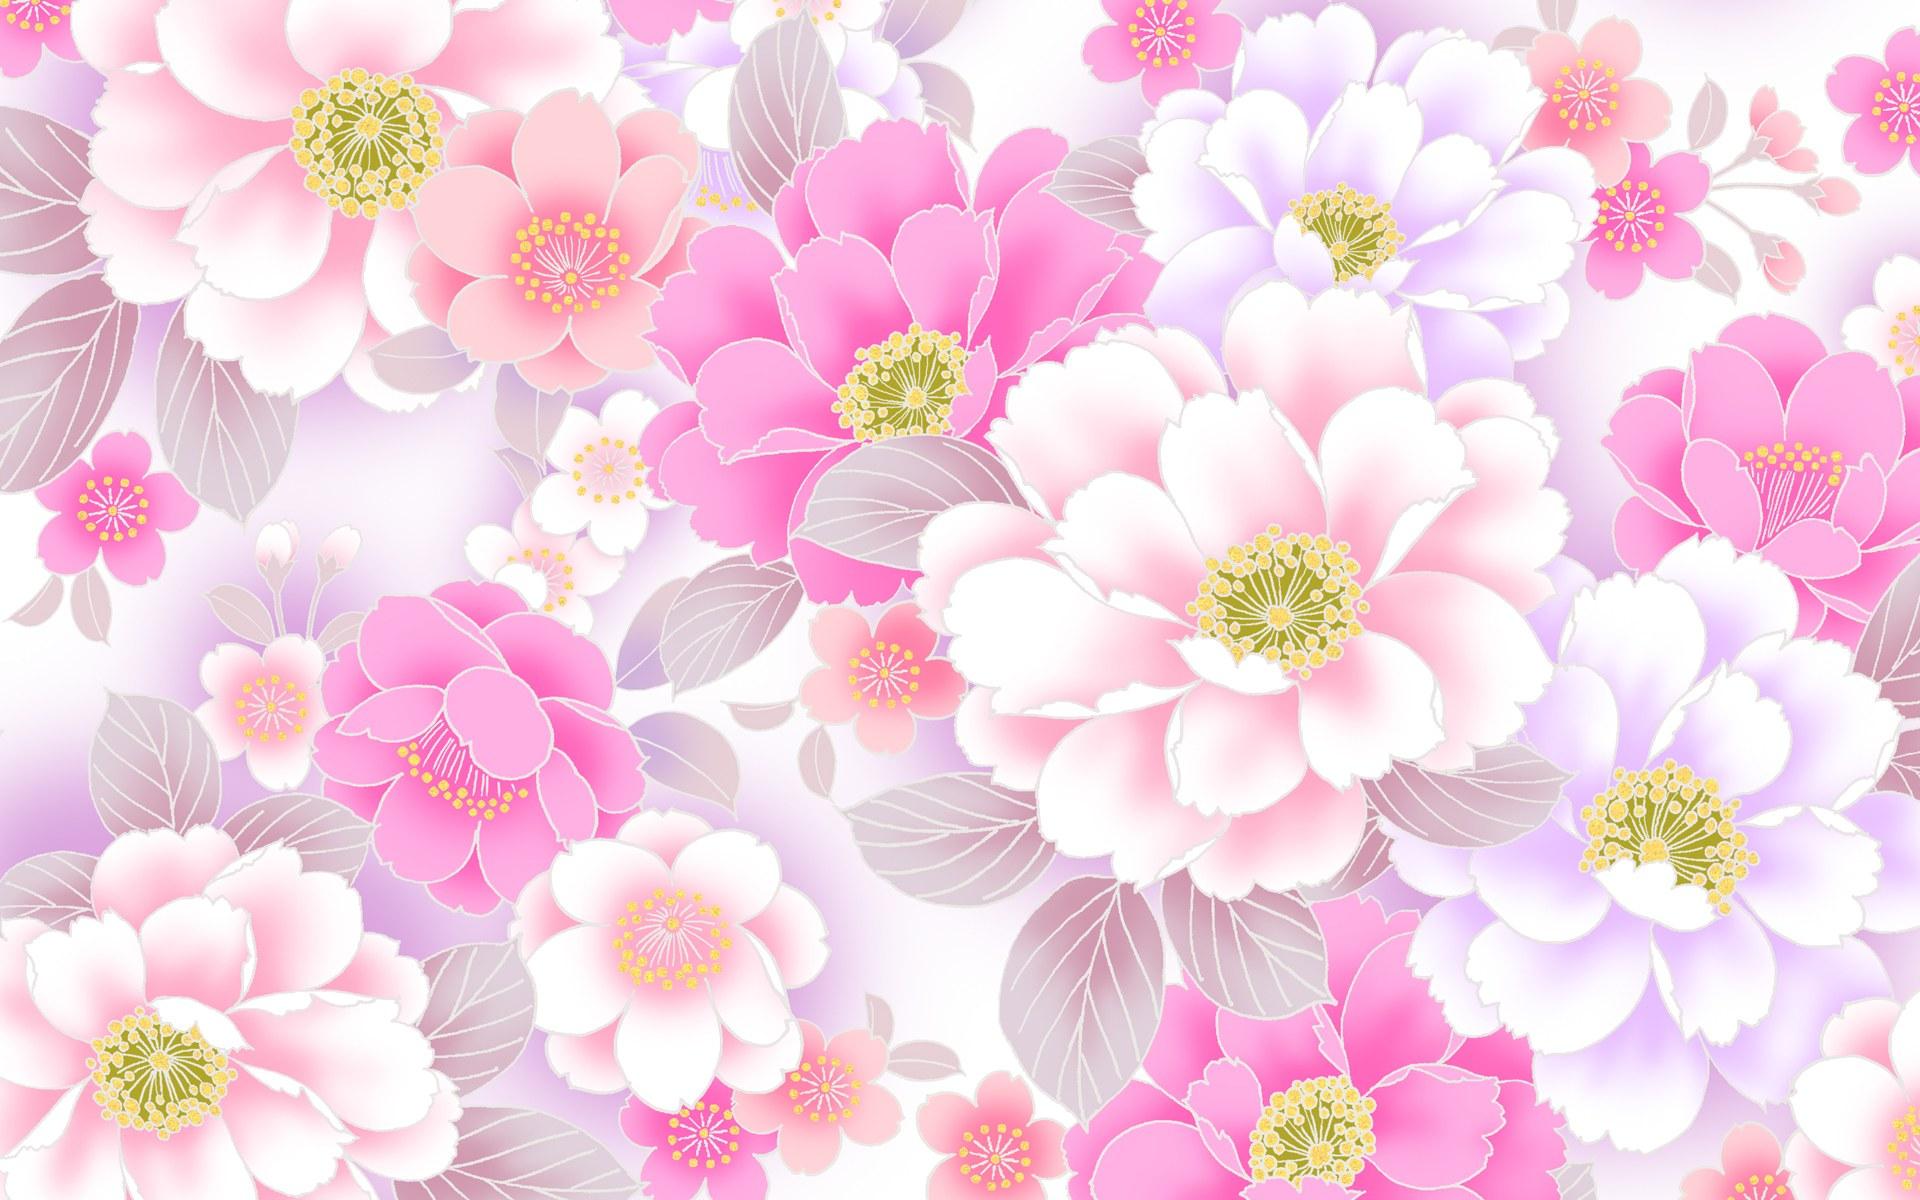 Floral Wallpaper 18984 1920x1200 px HDWallSourcecom